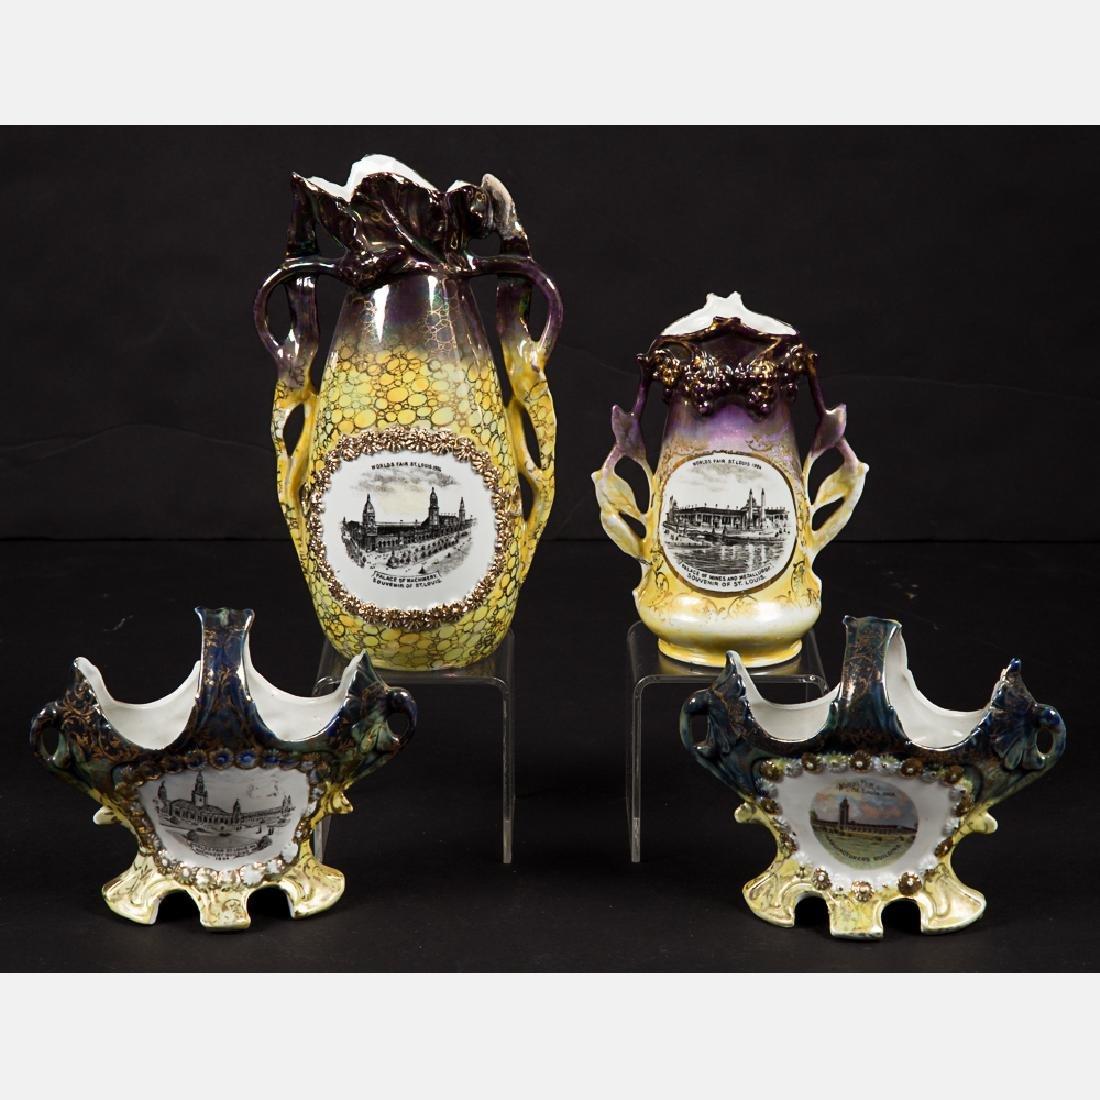 A Group of Four Porcelain Lustreware Decorative Items